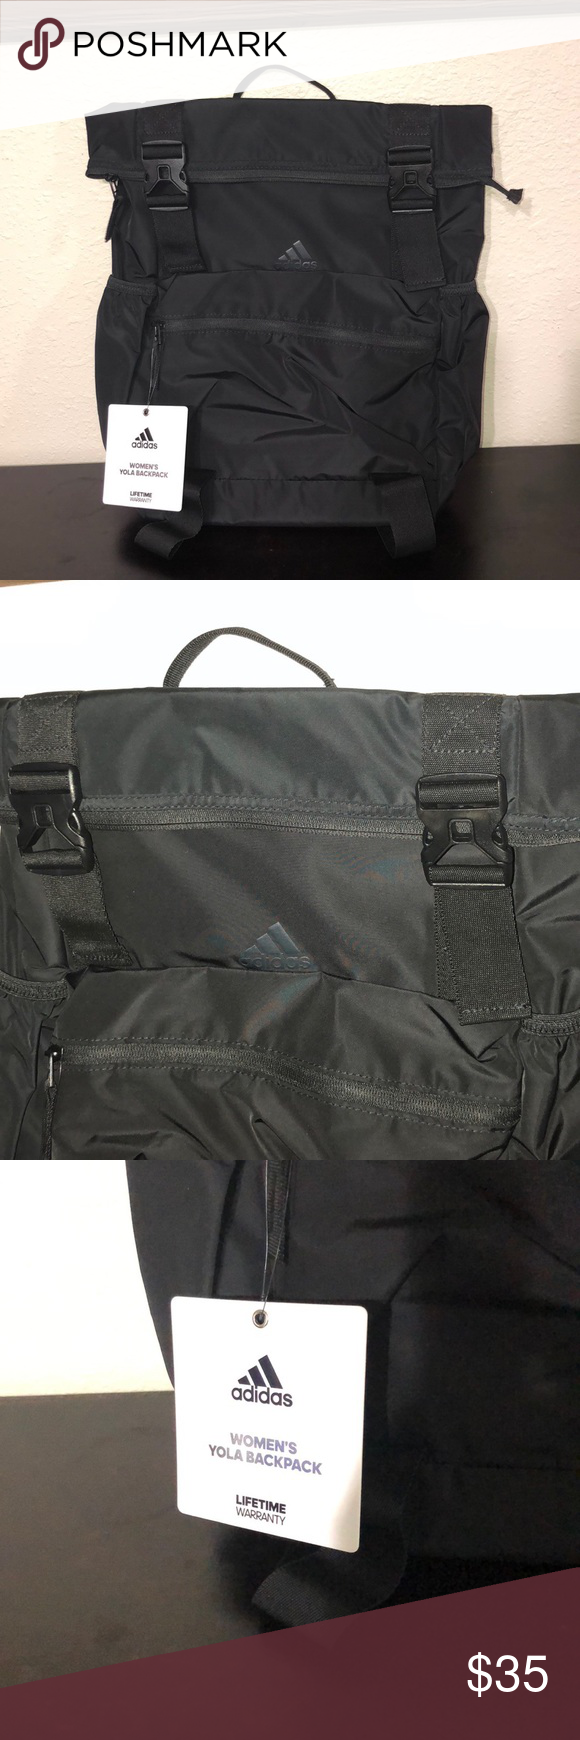 ... Adidas Womens Yola Backpack New adidas Bags Backpacks best service  e46bf 1023e ... 2dcf1ec23e